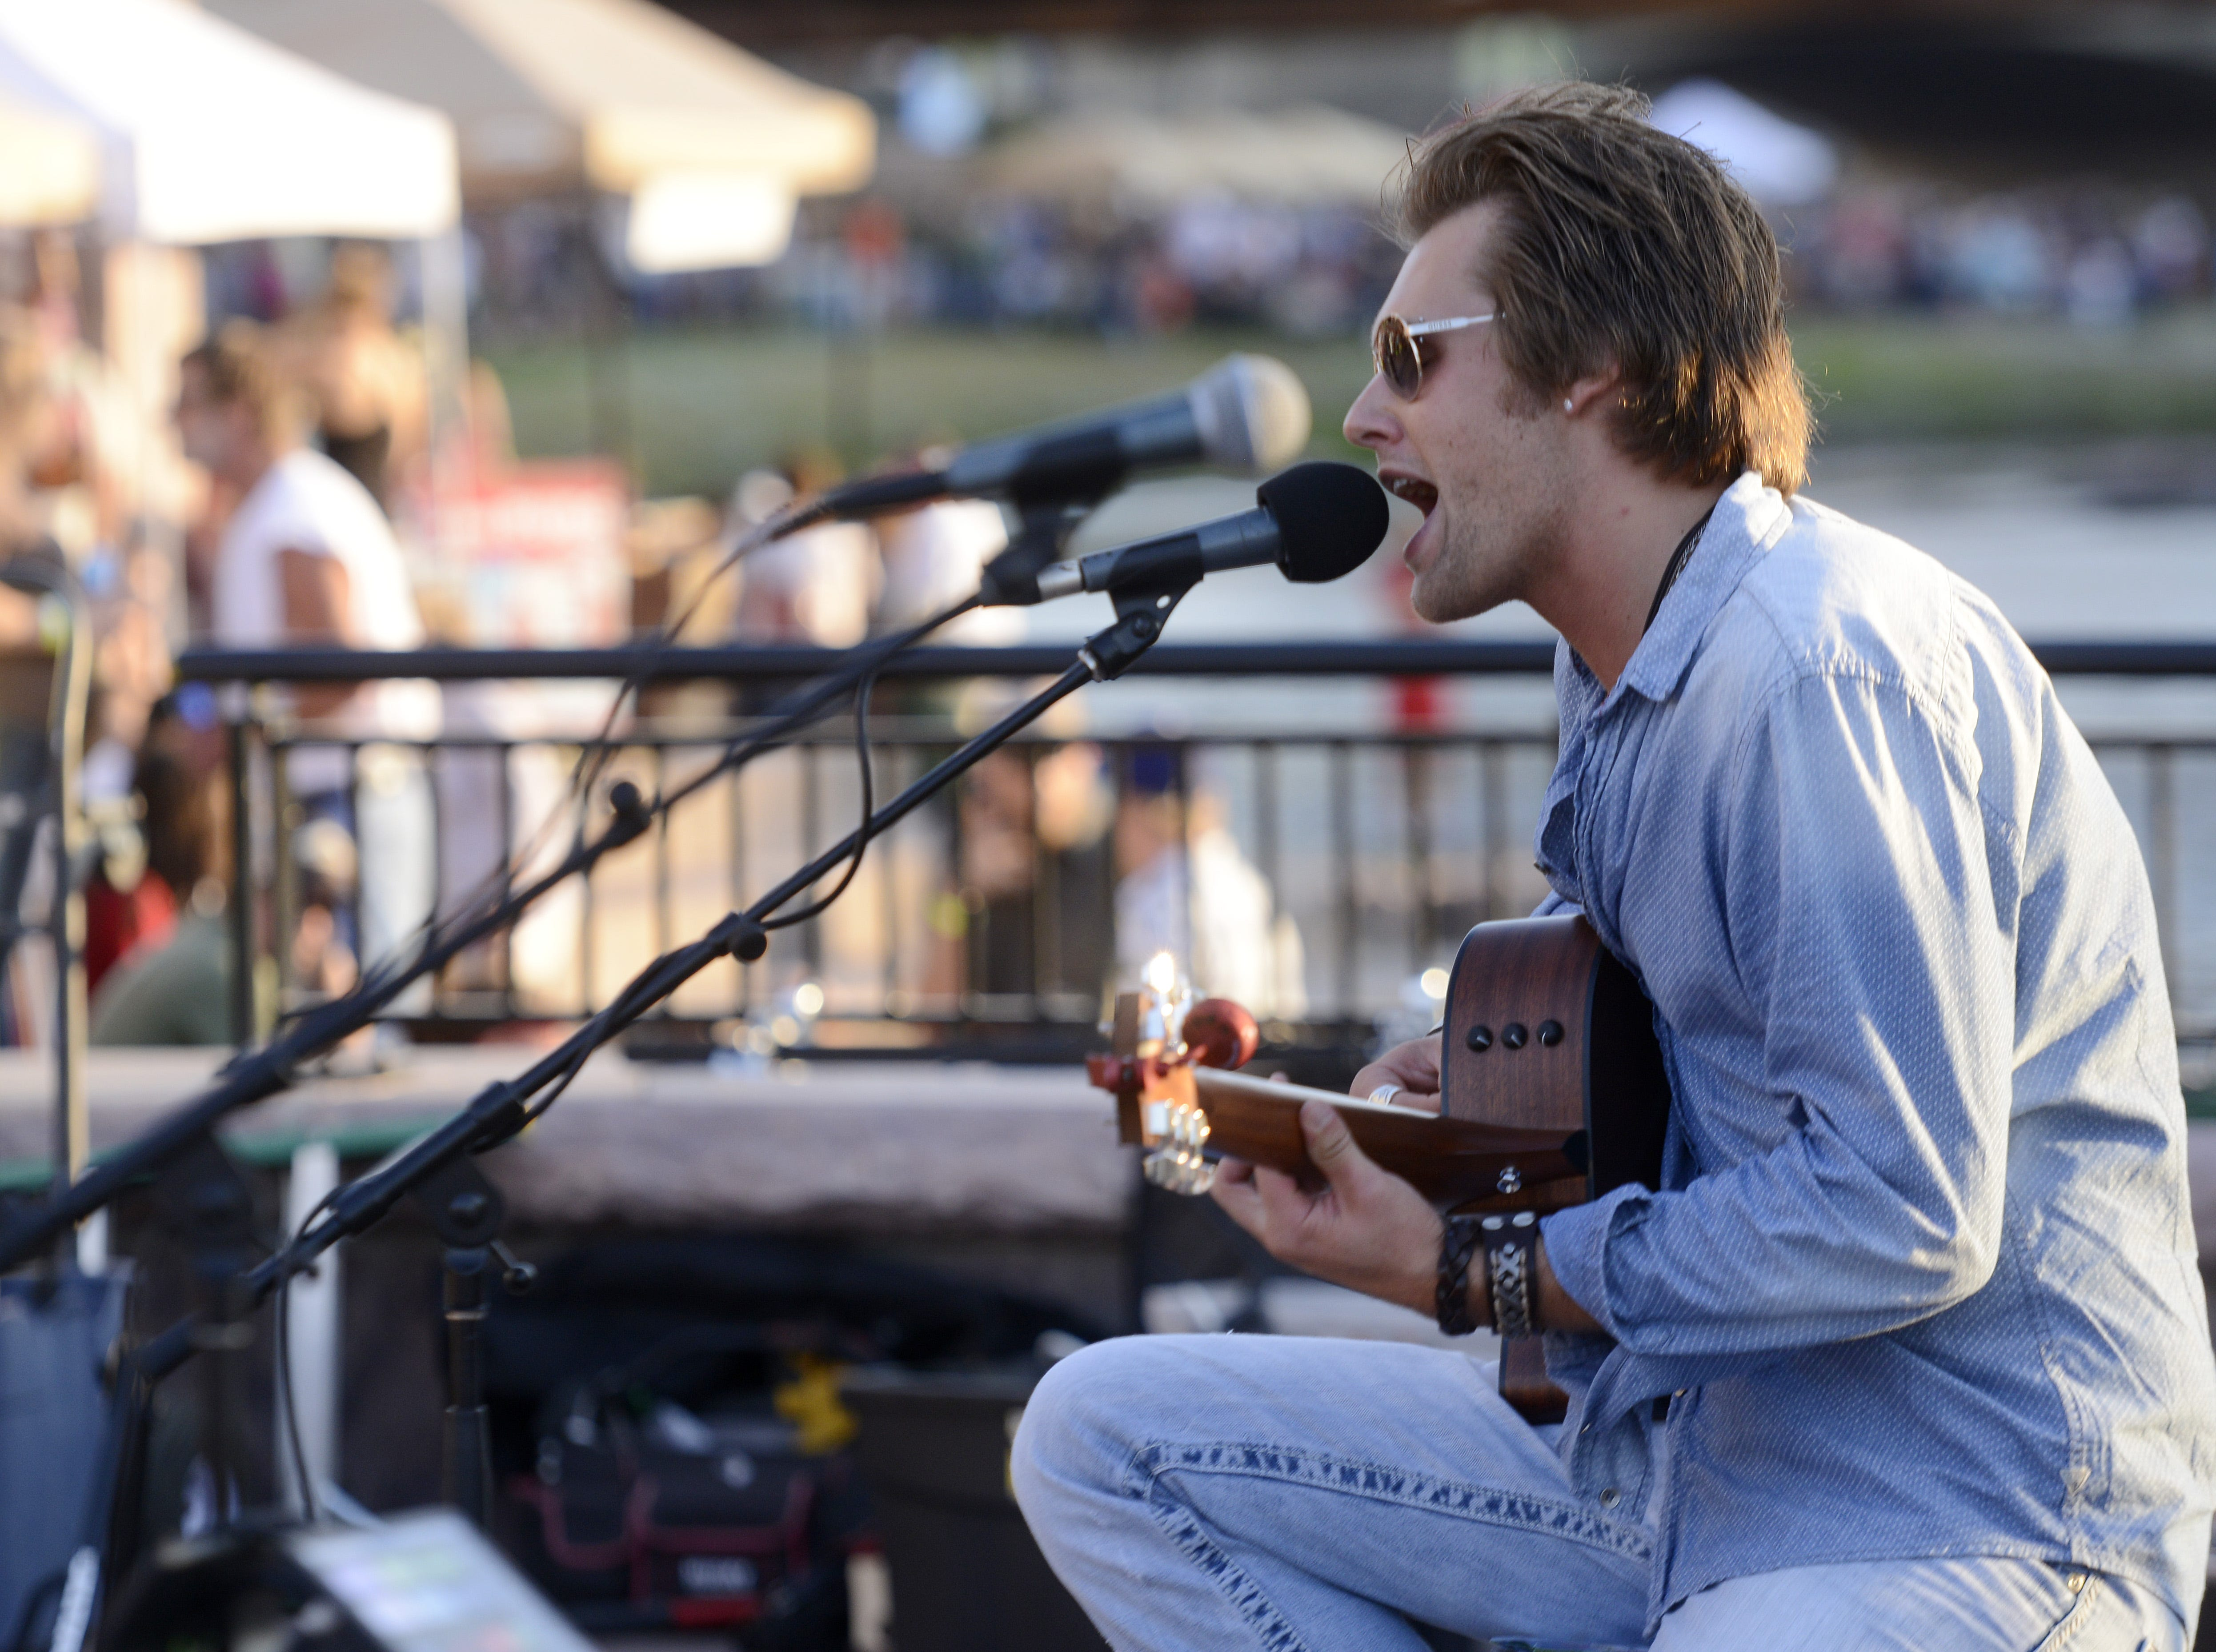 Cole Allen performs at Downtown Riverfest, August 17, 2013.